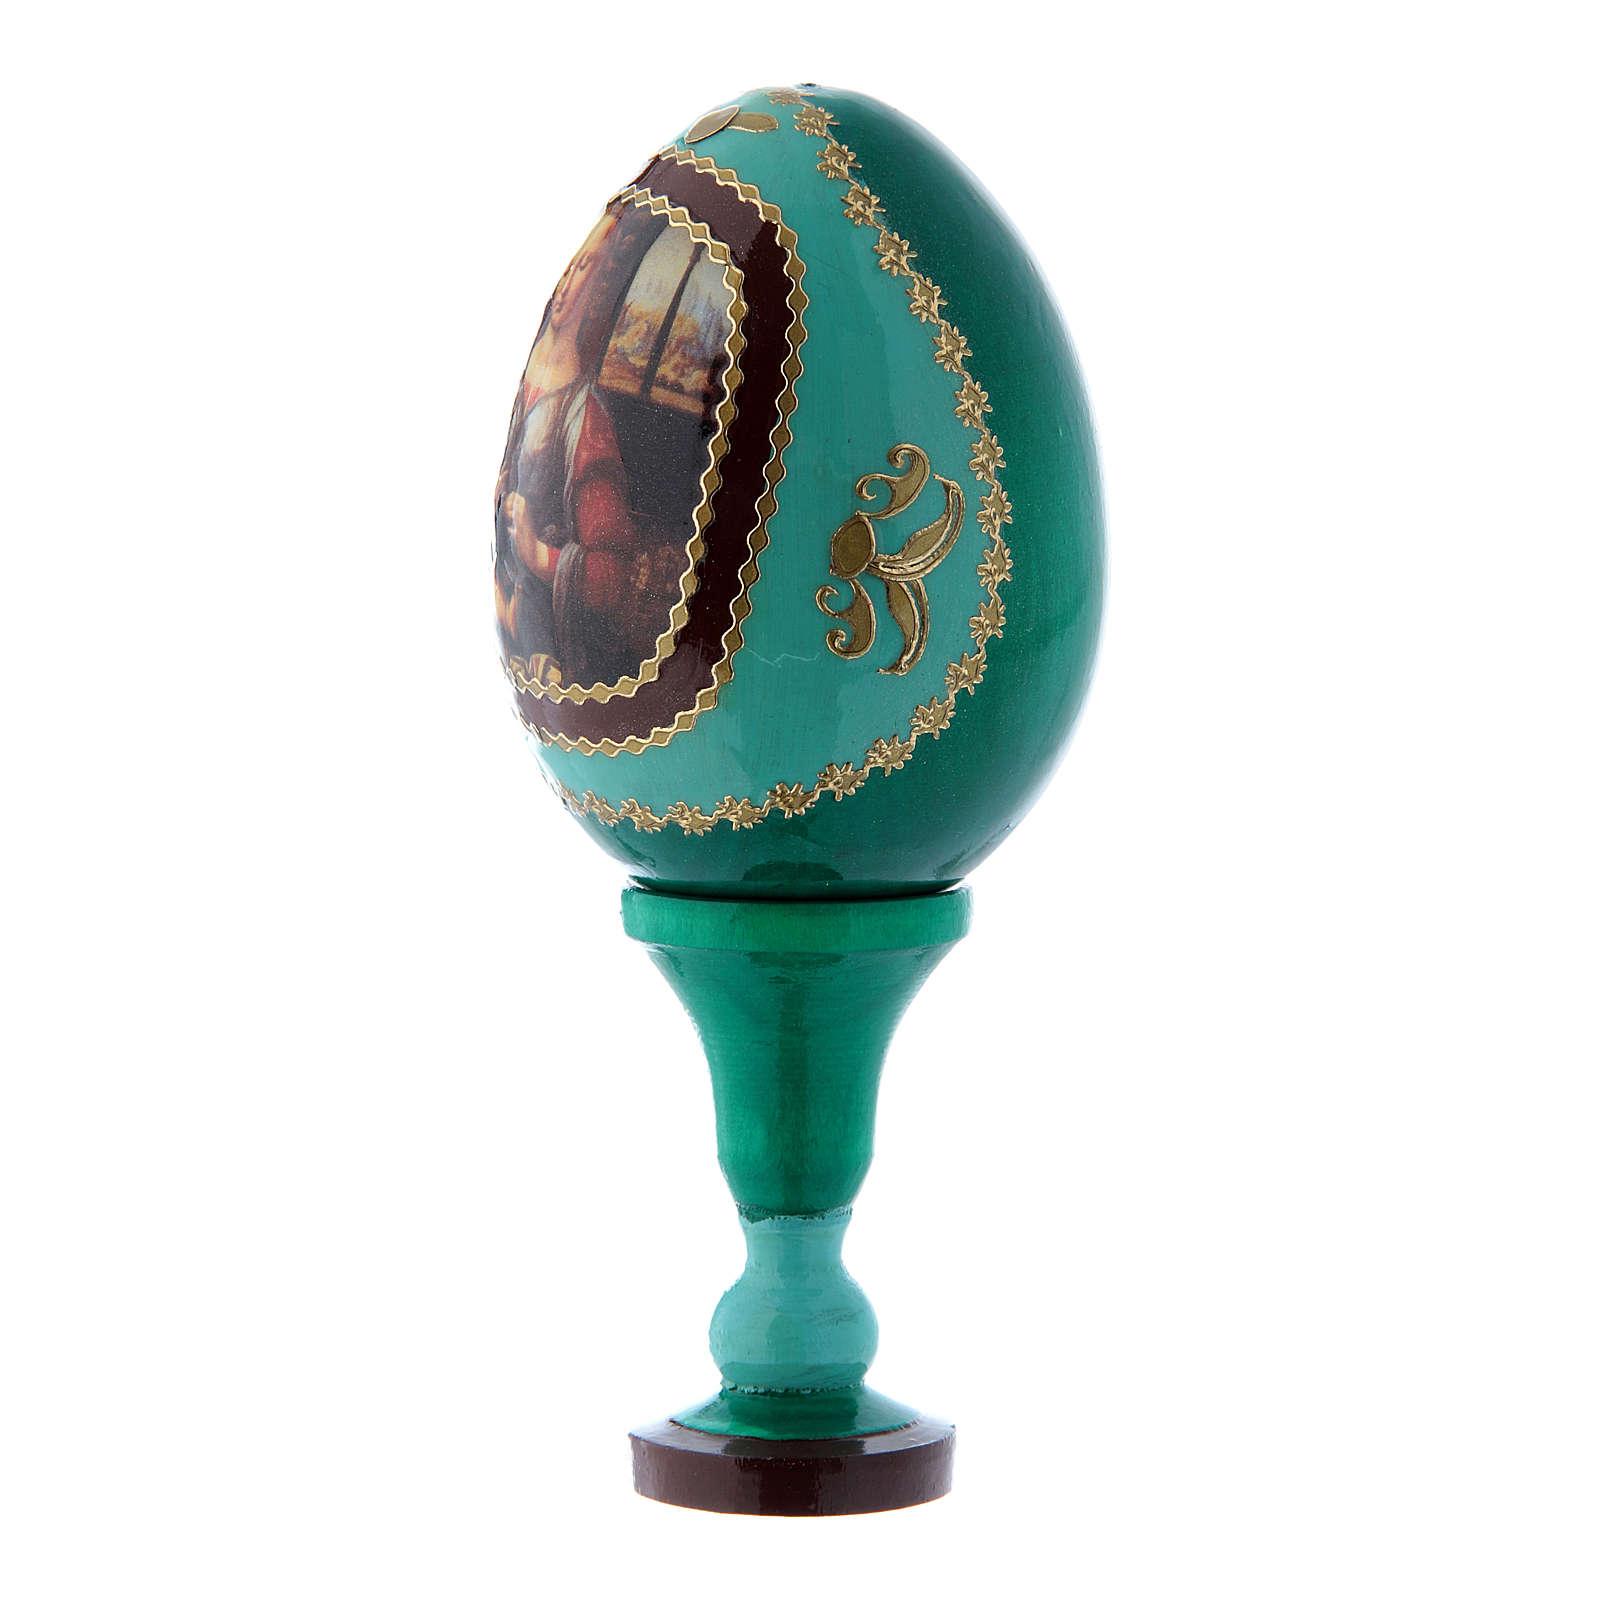 Uovo stile Fabergè russo verde La Madonna col Bambino découpage h tot 13 cm 4